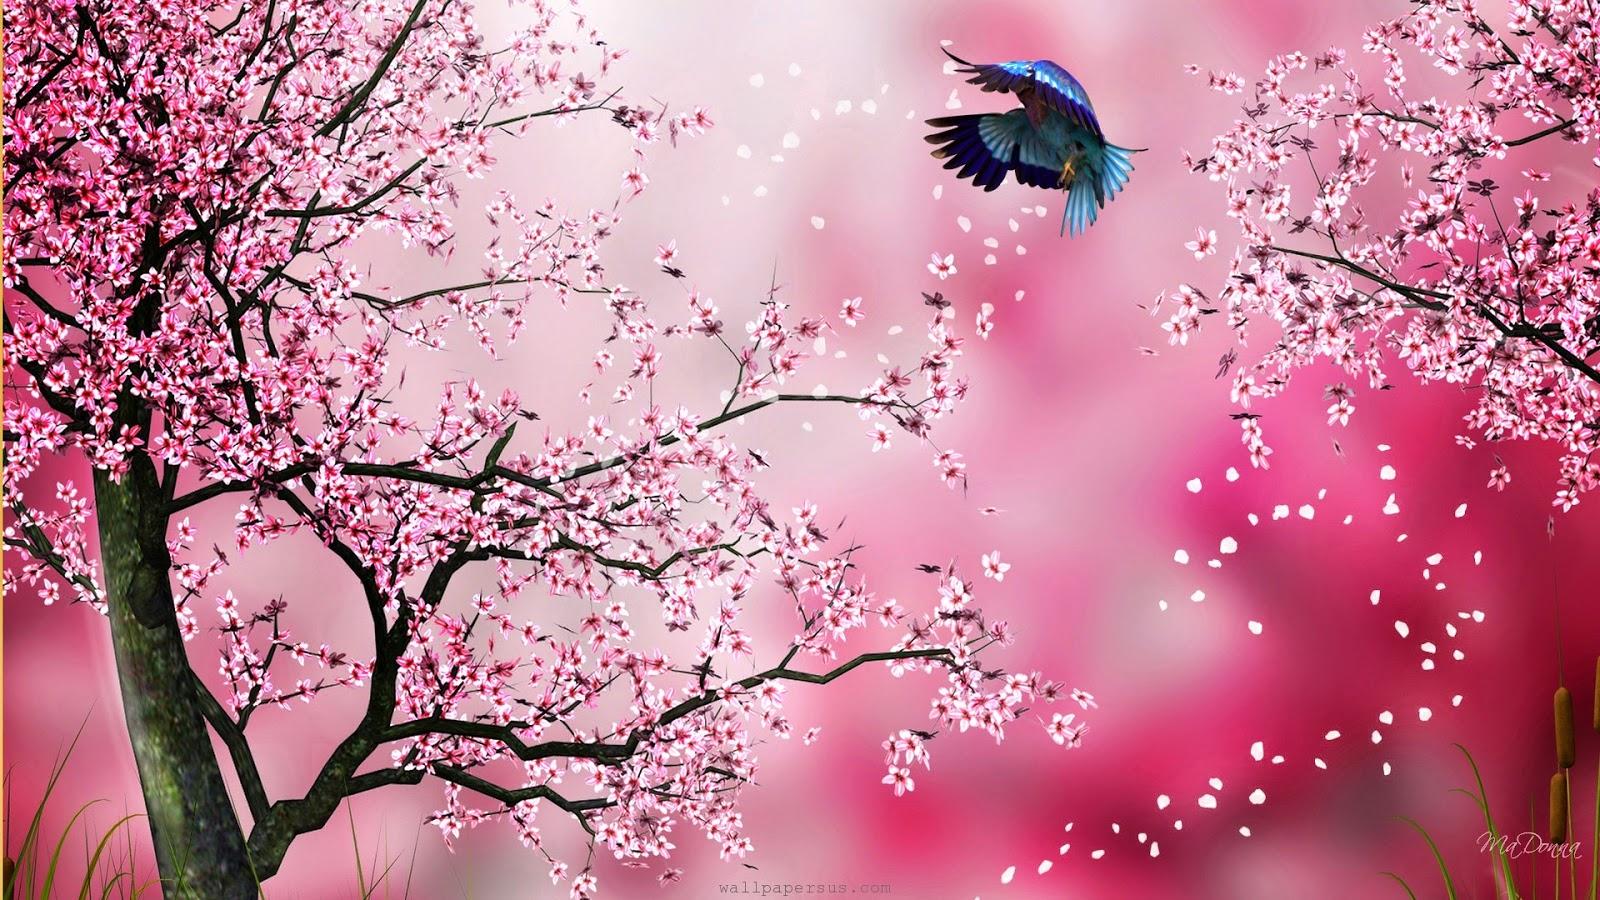 A la luz de la luna. - Página 3 CerezoJapanese-Sakura-Cherry-Blossompiccolor.com_